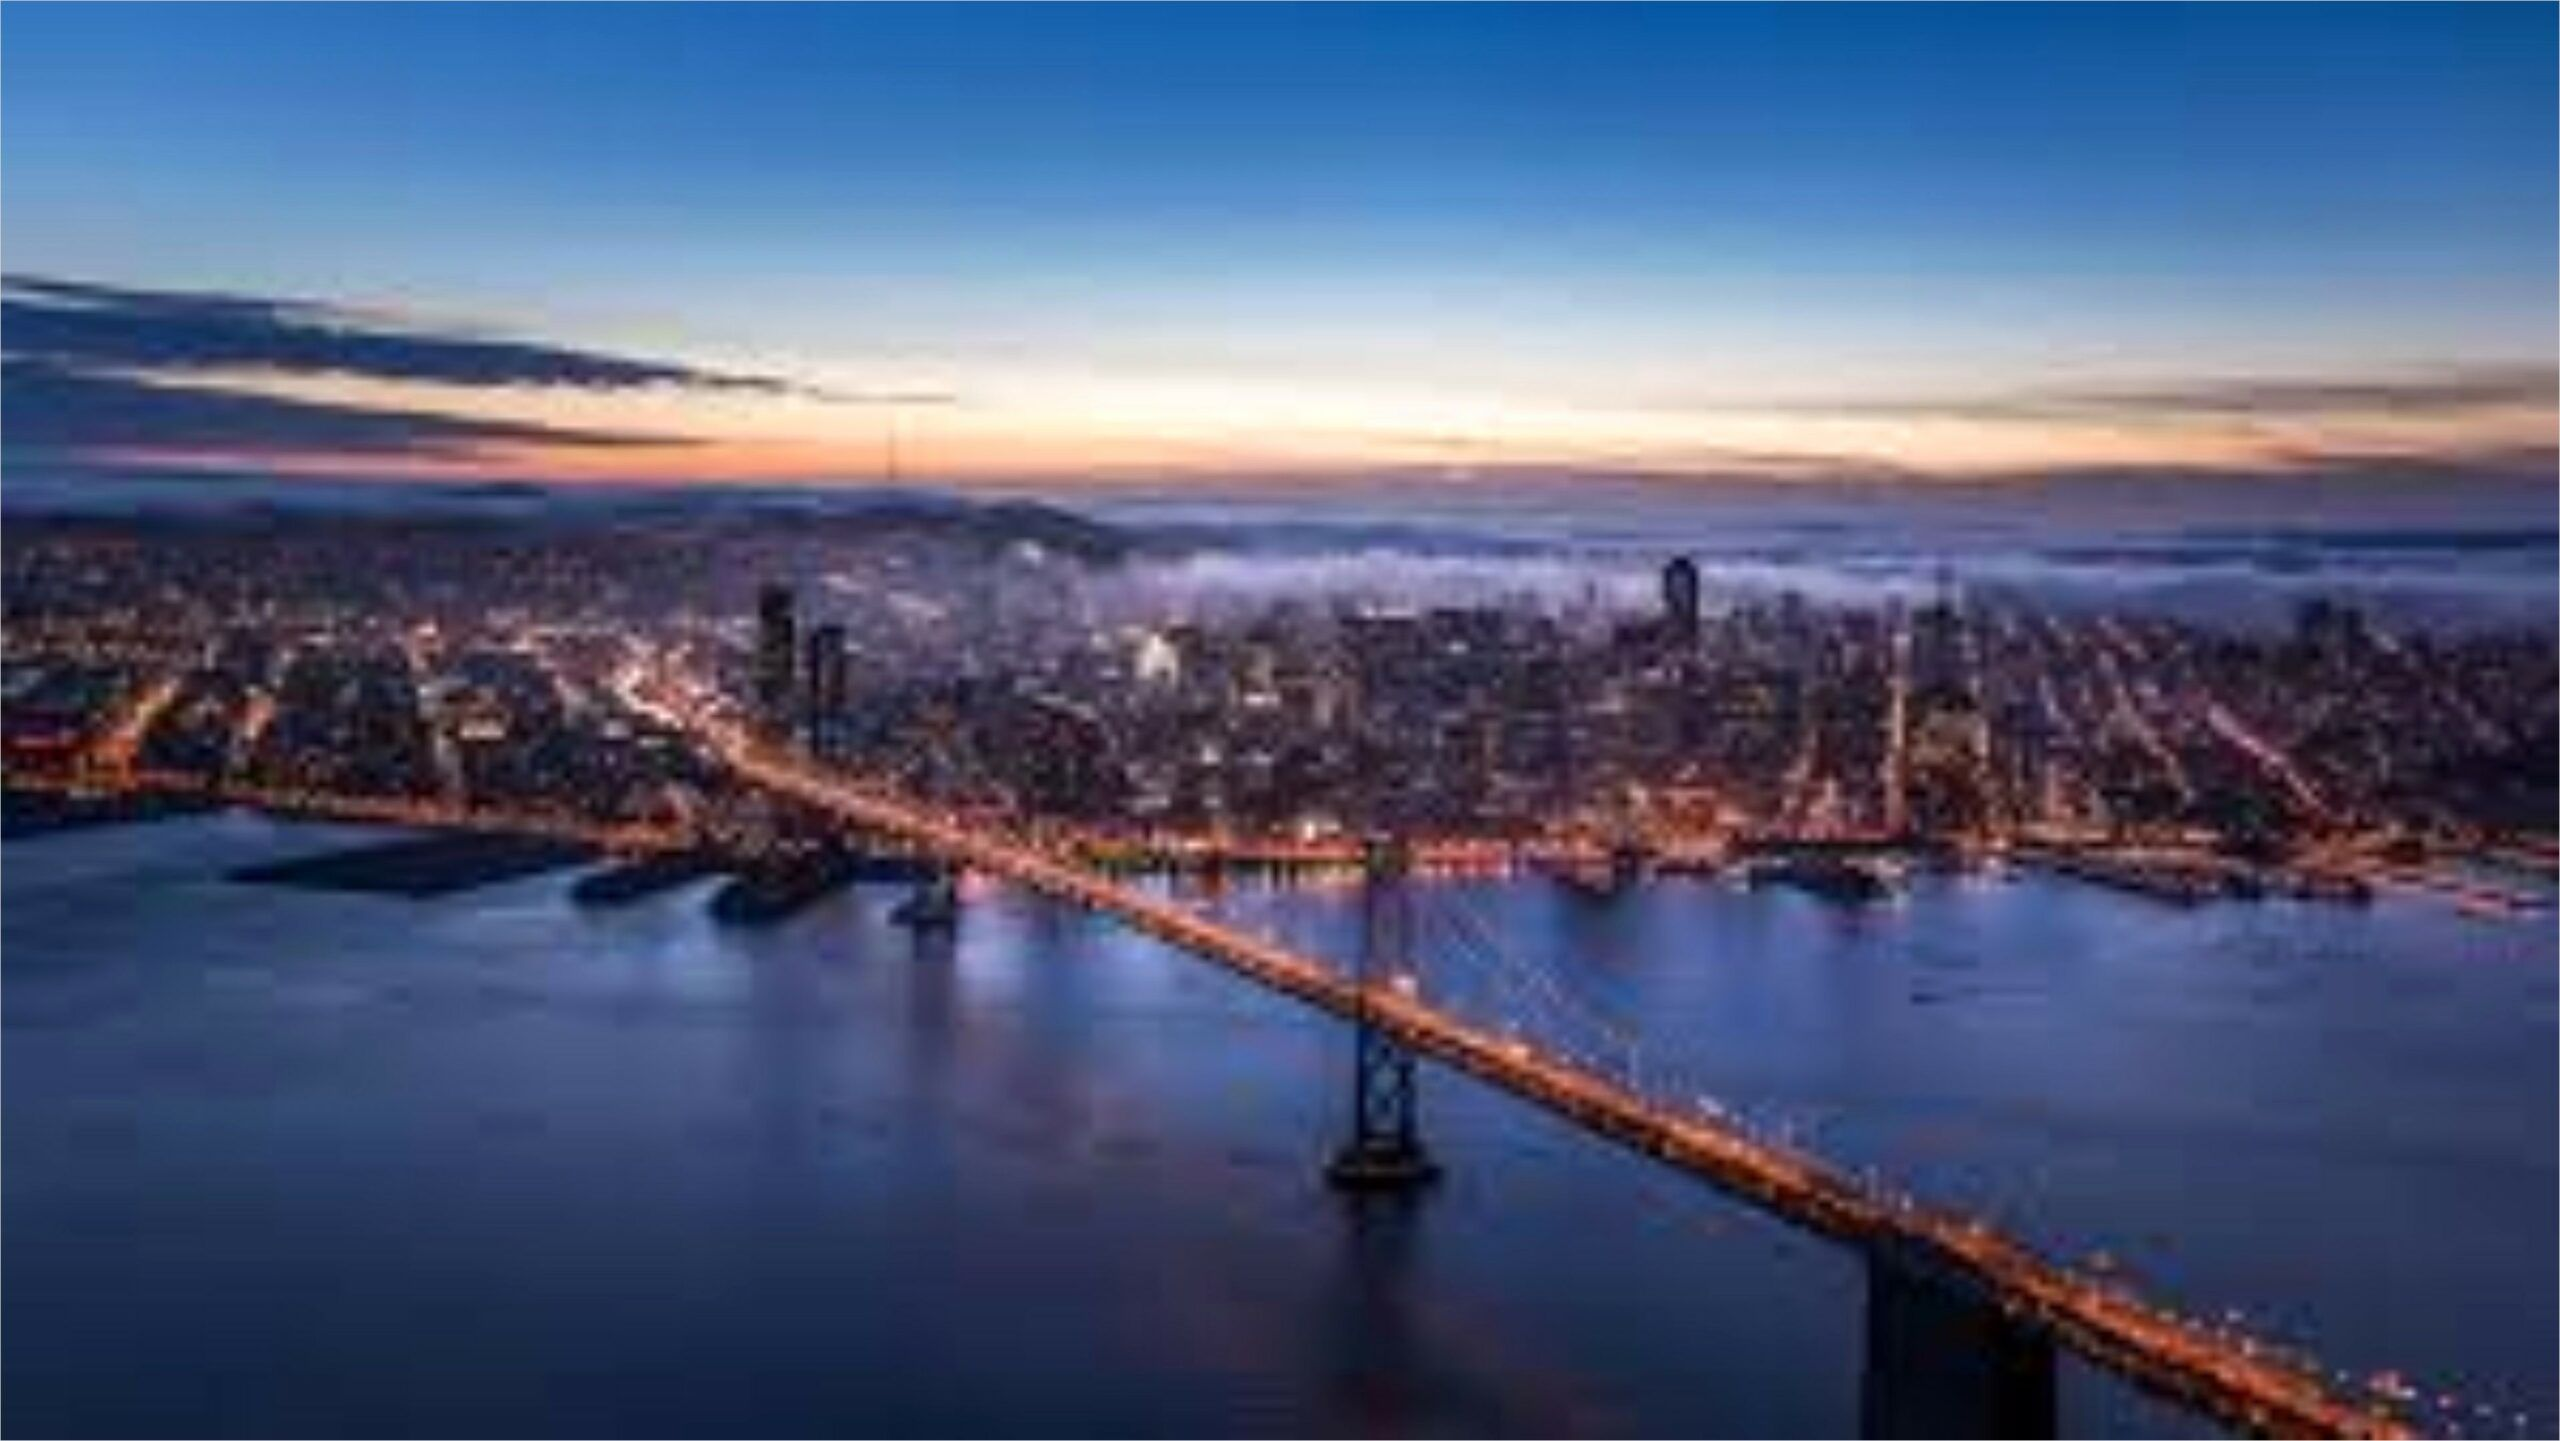 4k San Francisco Wallpapers In 2020 San Francisco Wallpaper Francisco San